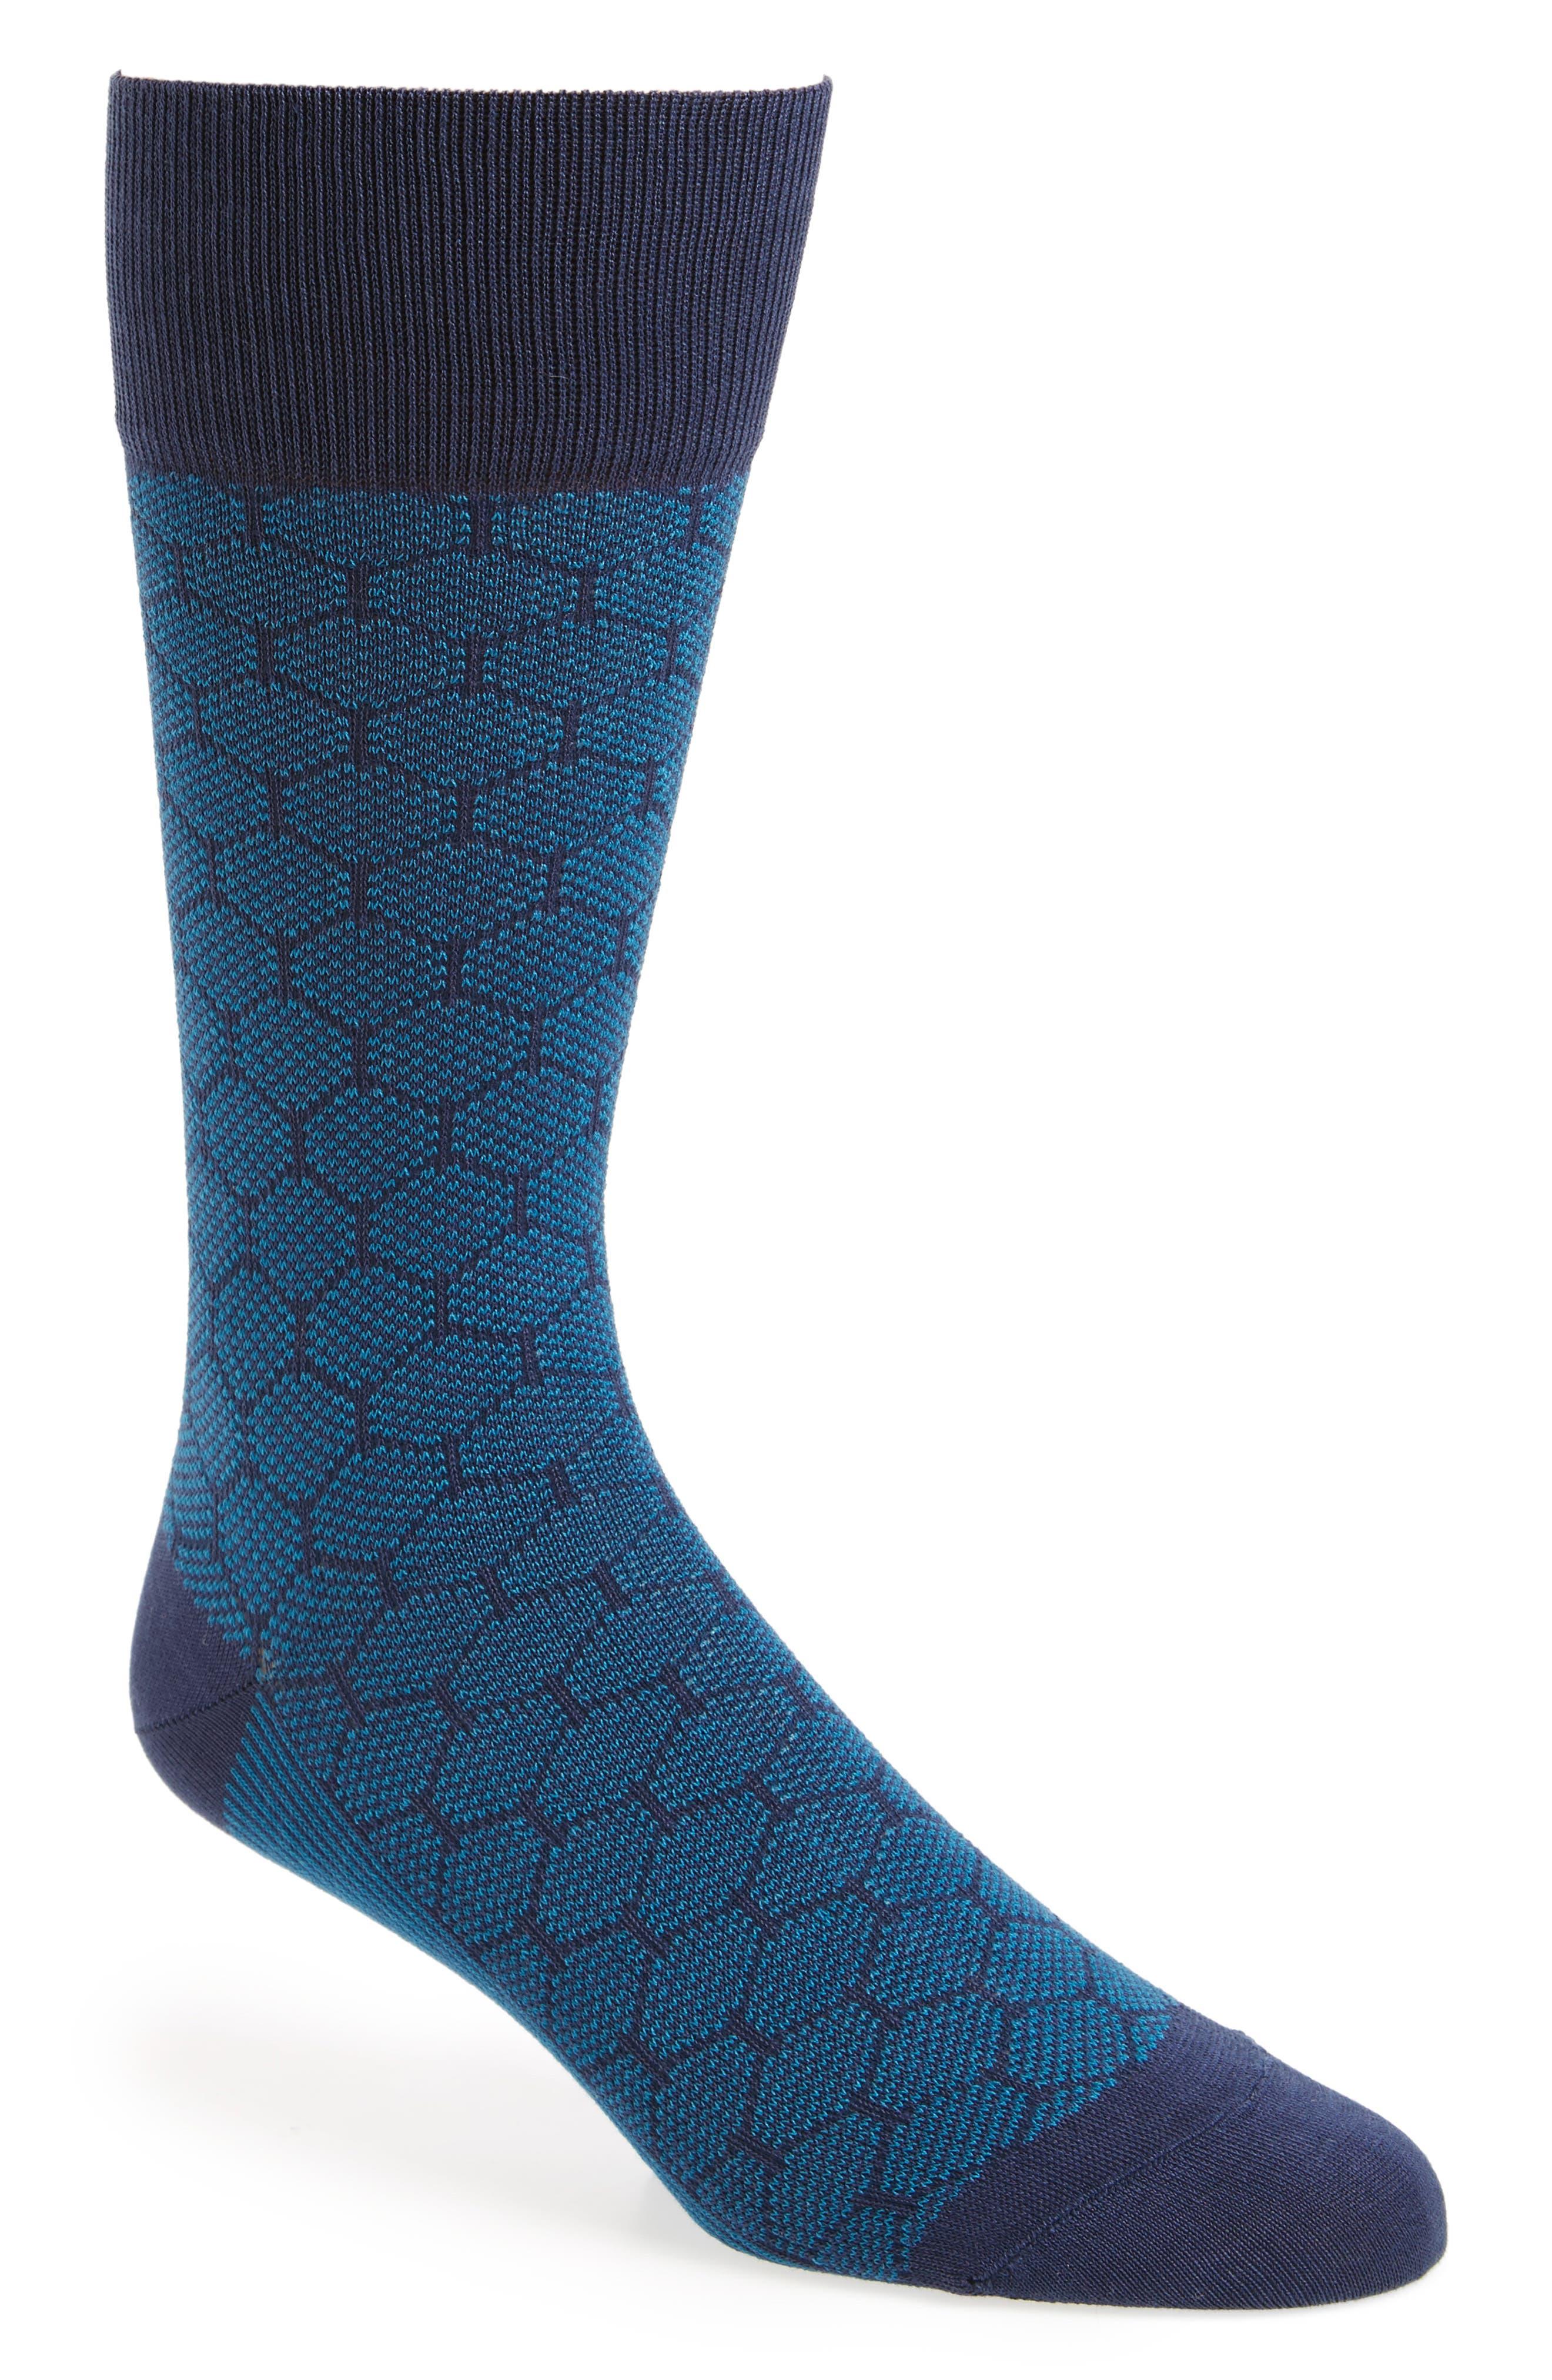 Mercerized Honeycomb Socks,                         Main,                         color, Blue/ Navy